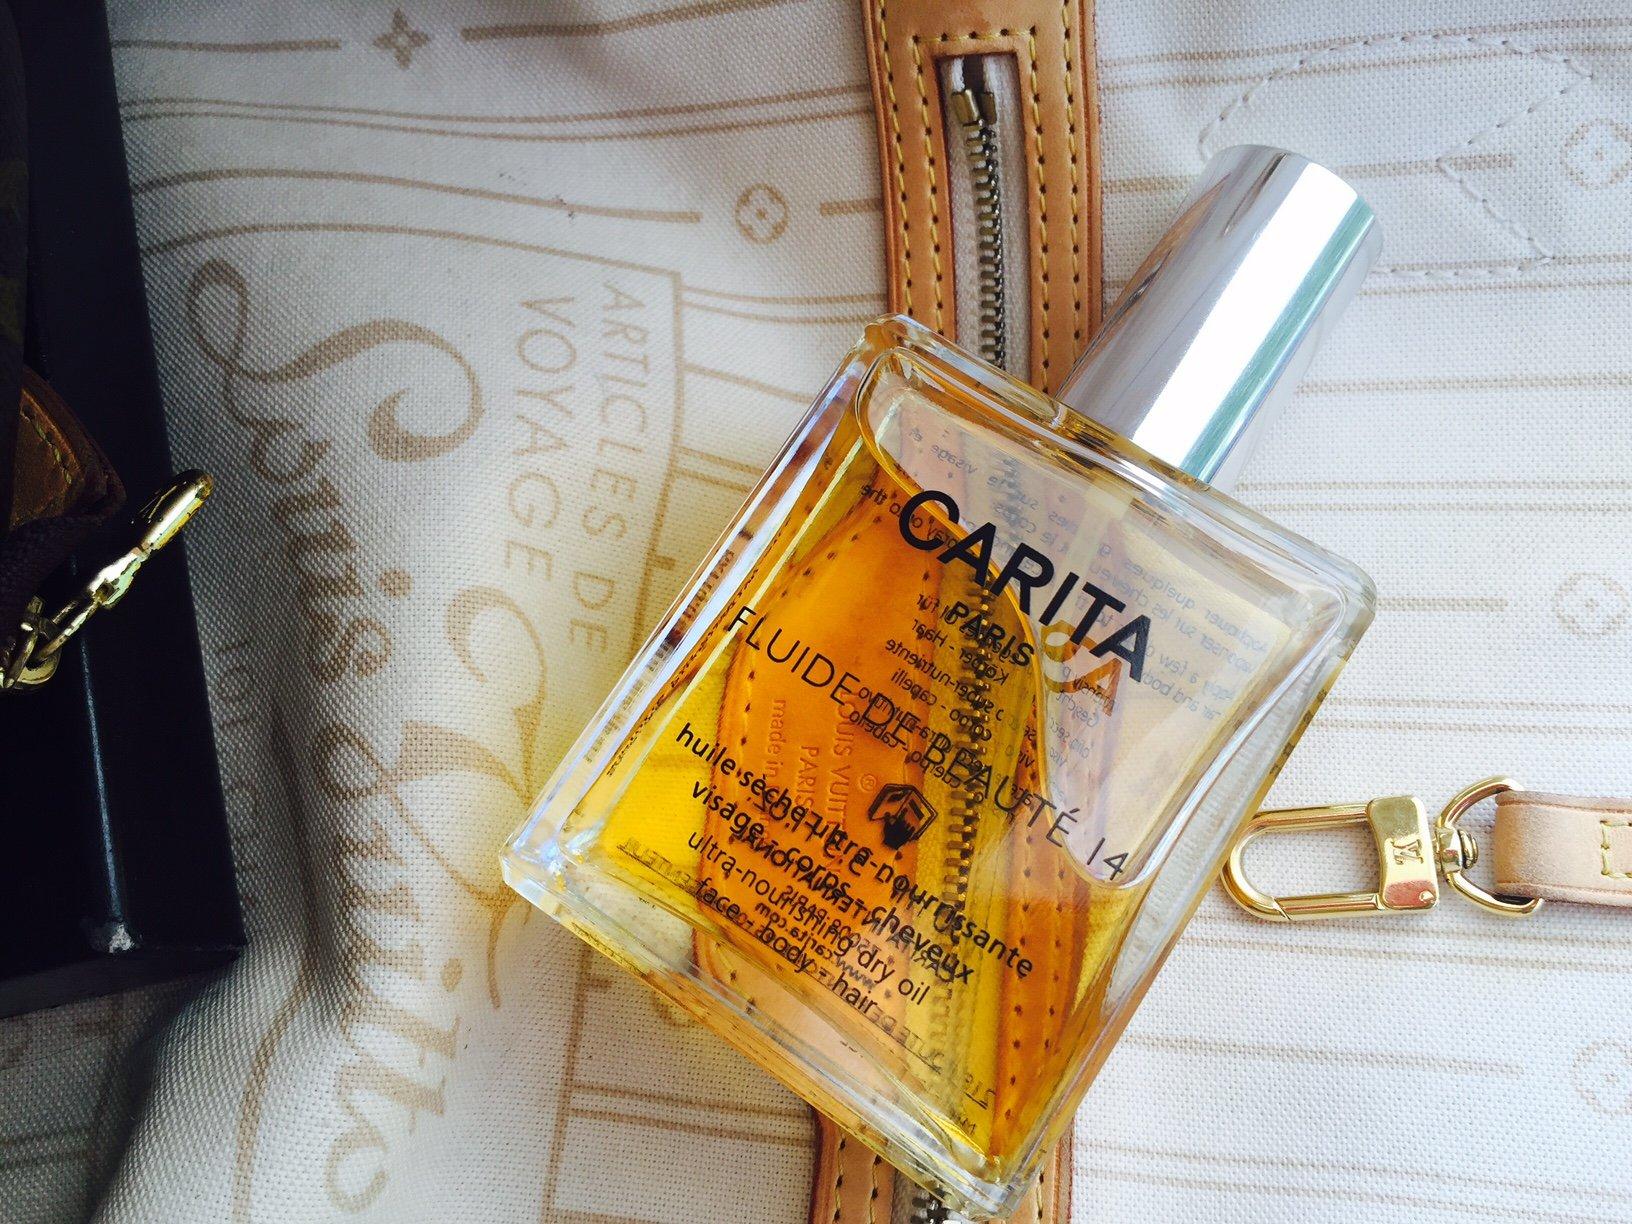 Foto del fluido di bellezza di Carita Paris